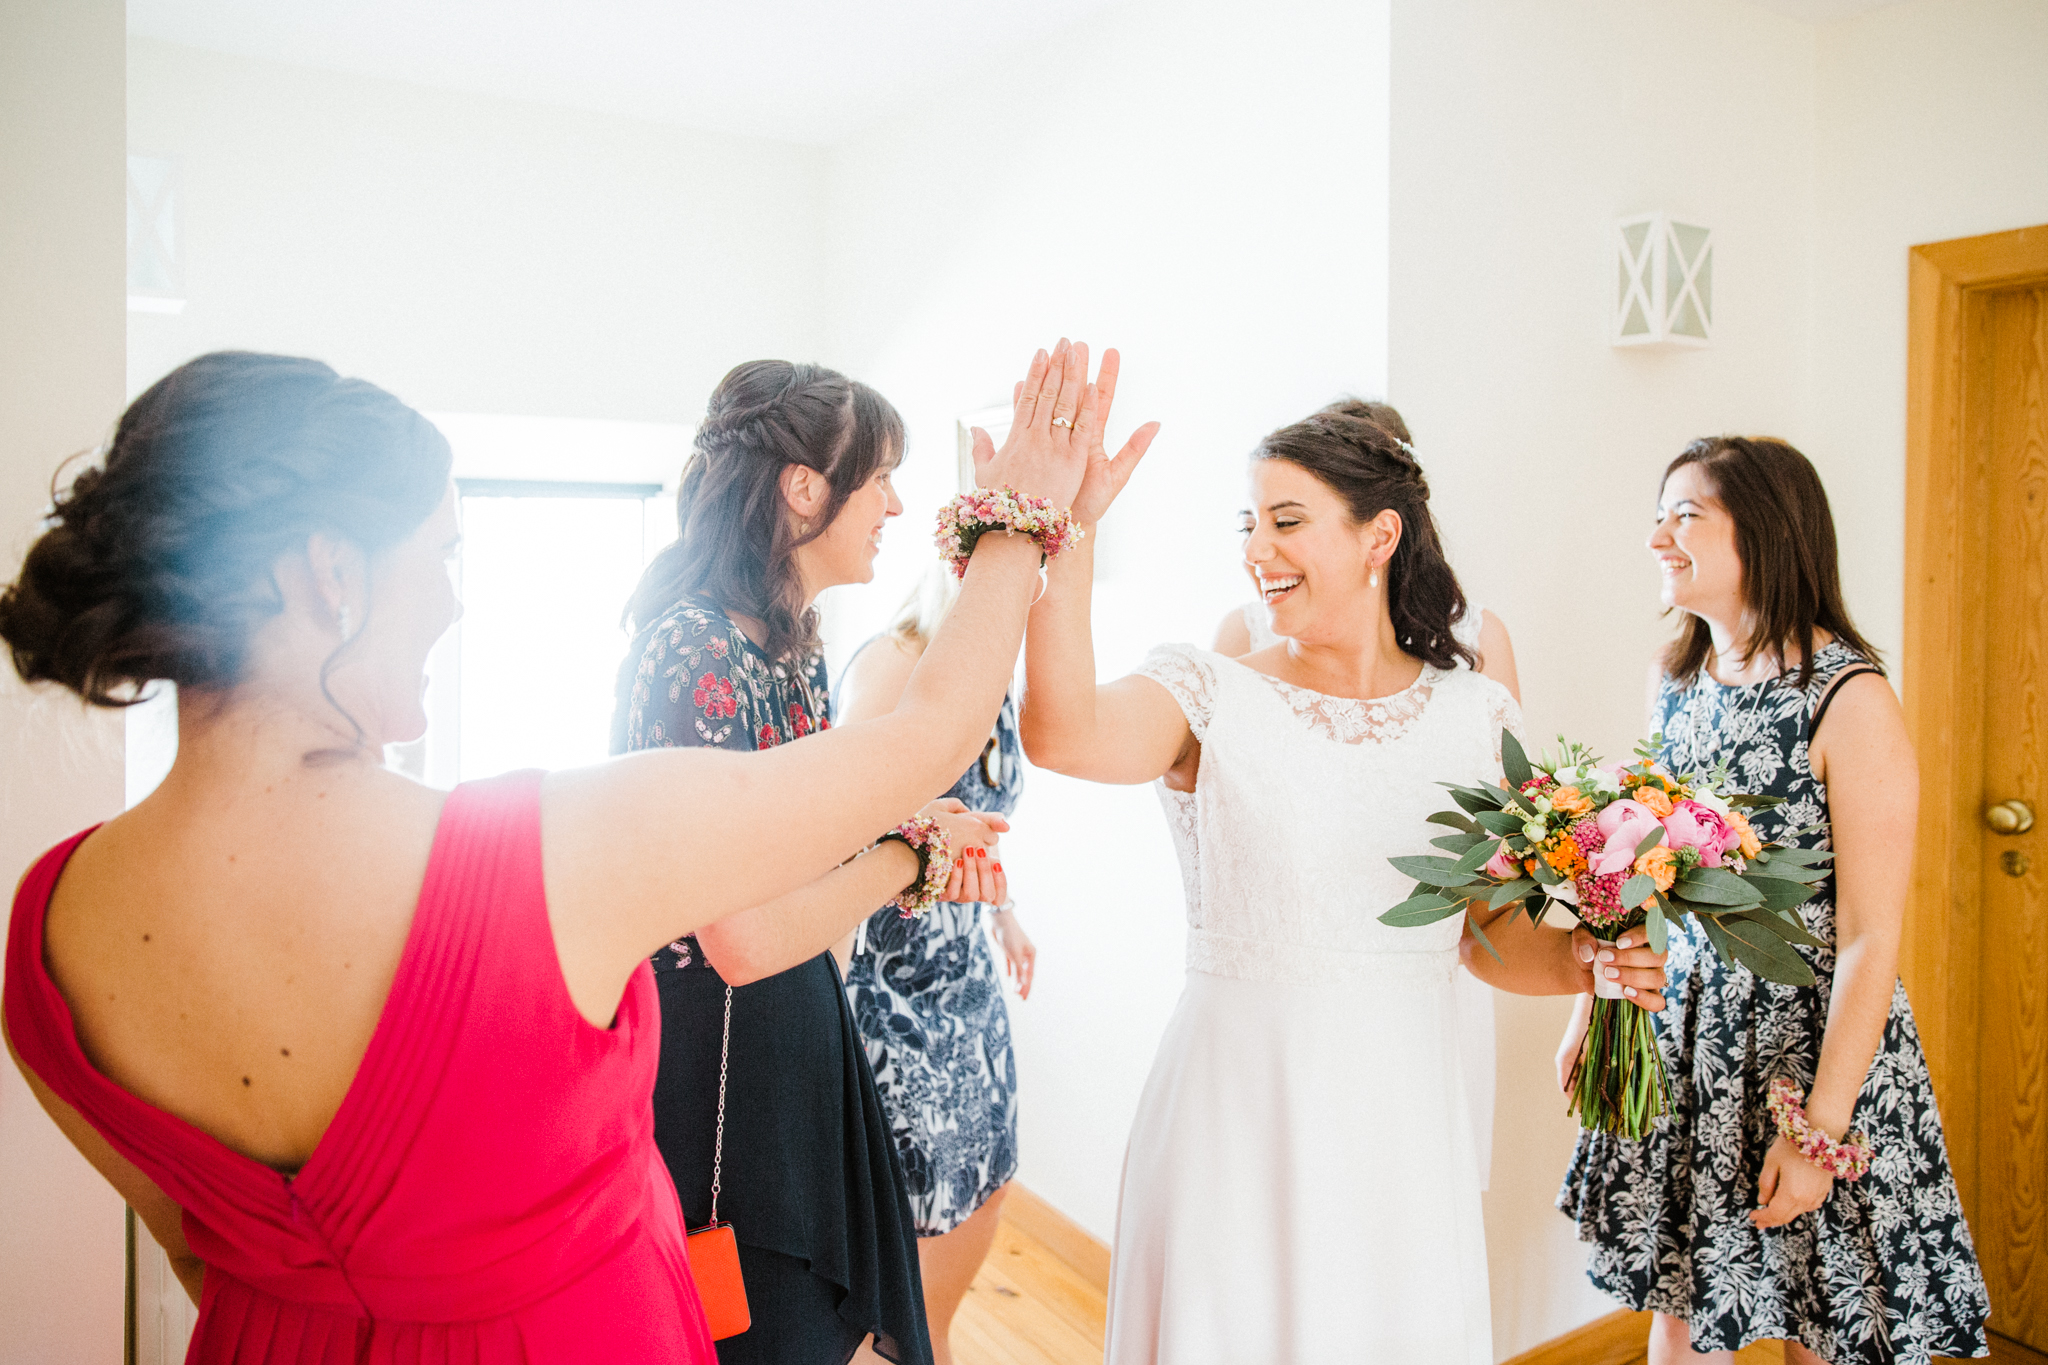 casamento-is-quinta-dos-machados-37